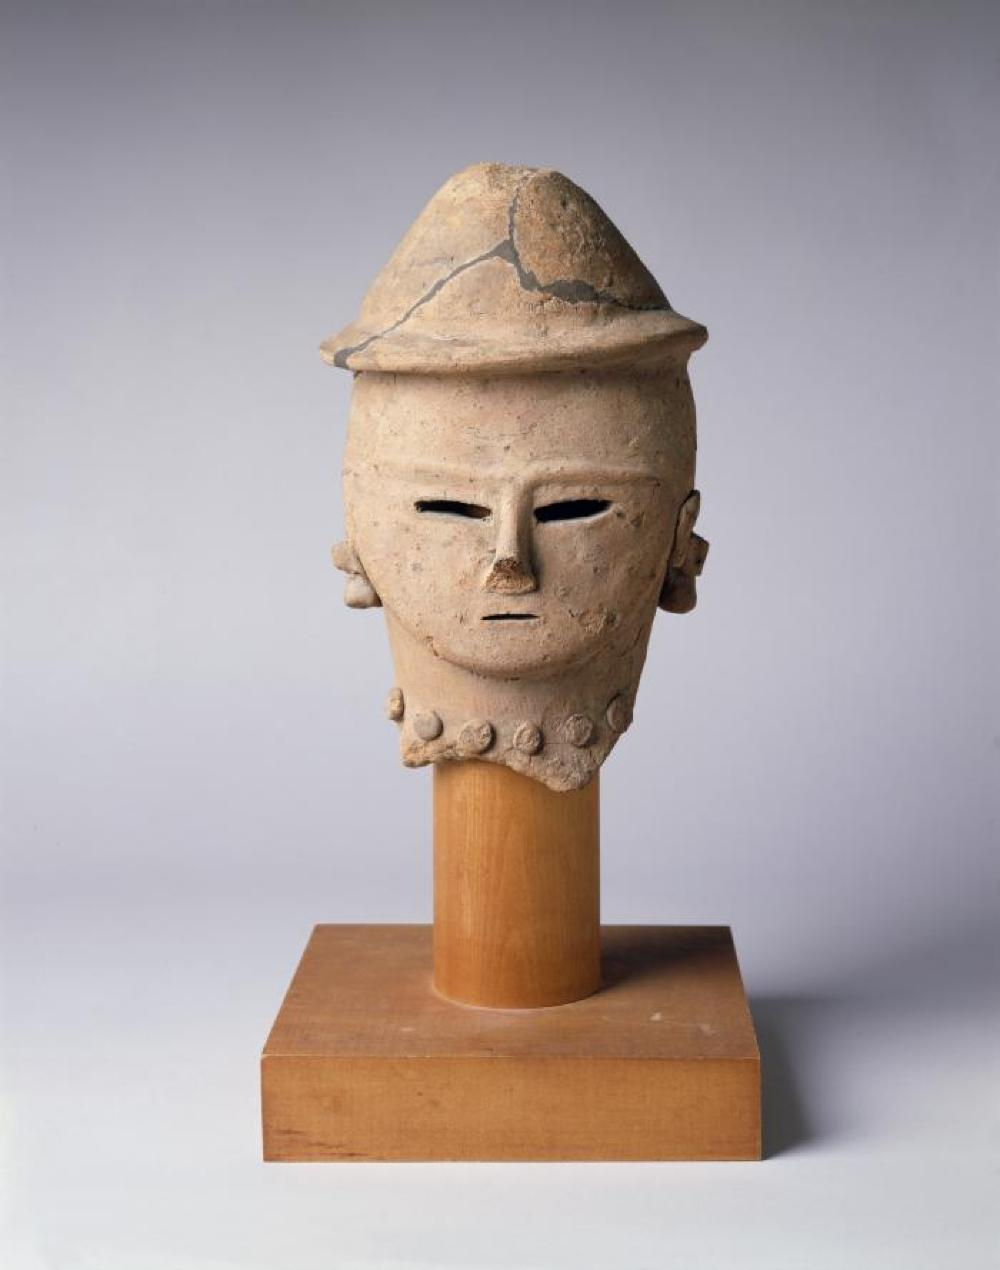 Japanese; Head of Haniwa Figure; Tumulus Period, 5th-6th century; Earthenware, wood base; 6 1/8 x 4 1/4 x 5 in., base 6 /14 x 6 in.; Private collection. (Study Collection; Collectibles, C-S-47)